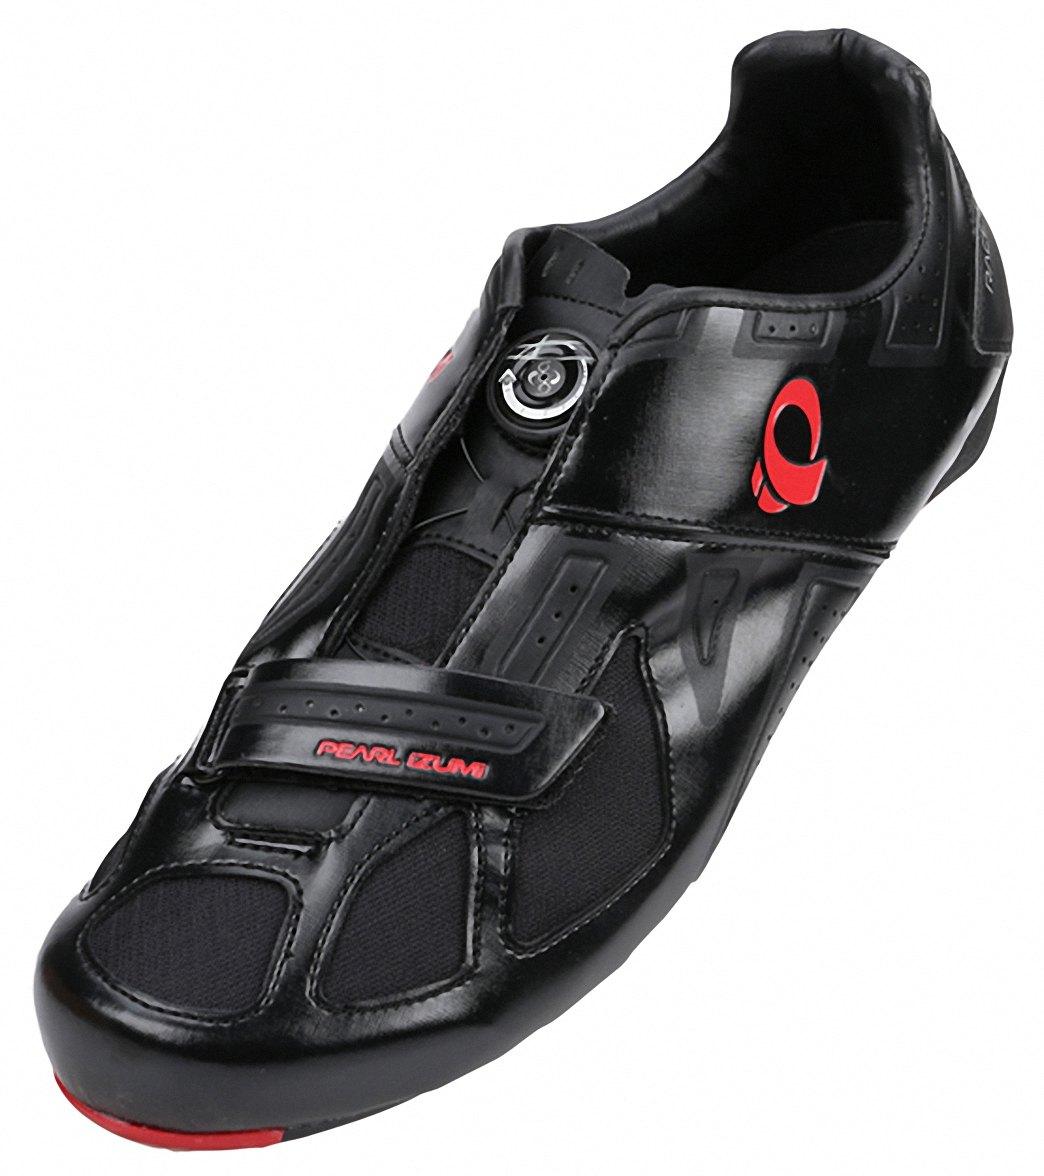 Pearl Izumi Quest Mtb Shoes Size